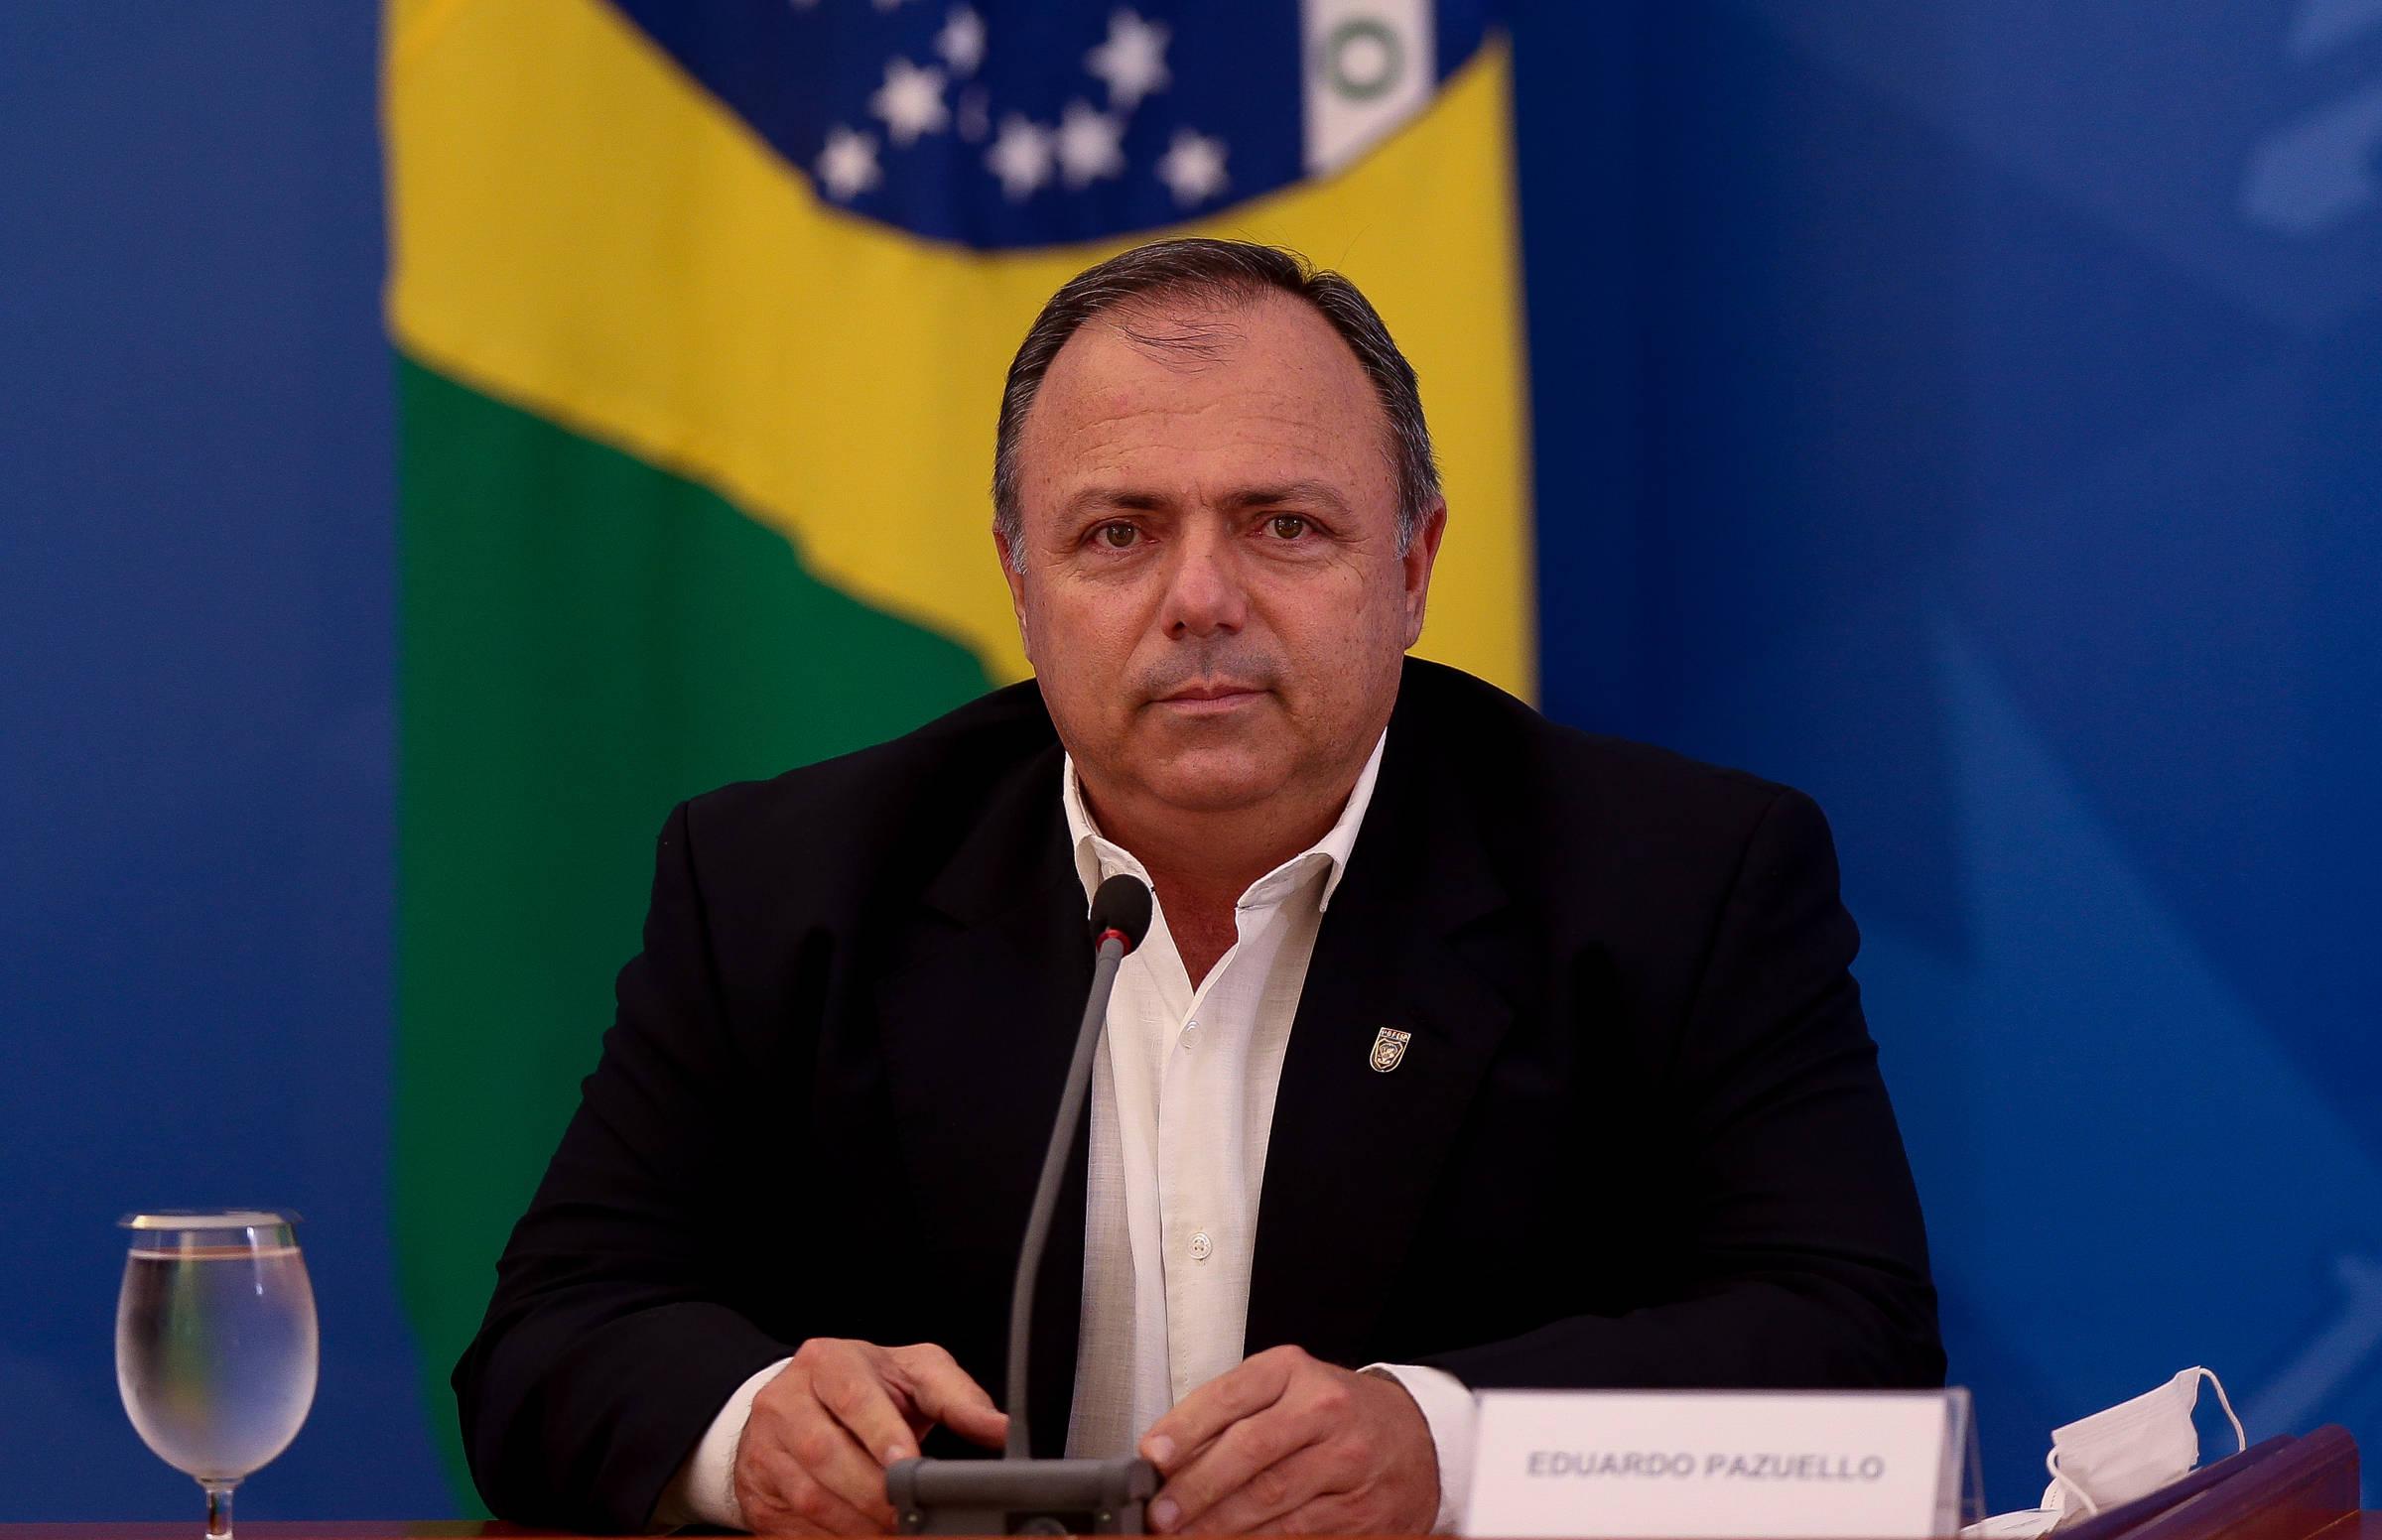 Guias de Bolsonaro e Pazuello chama Gilmar Mendes - 15.7.2020. - Monica Bergamo